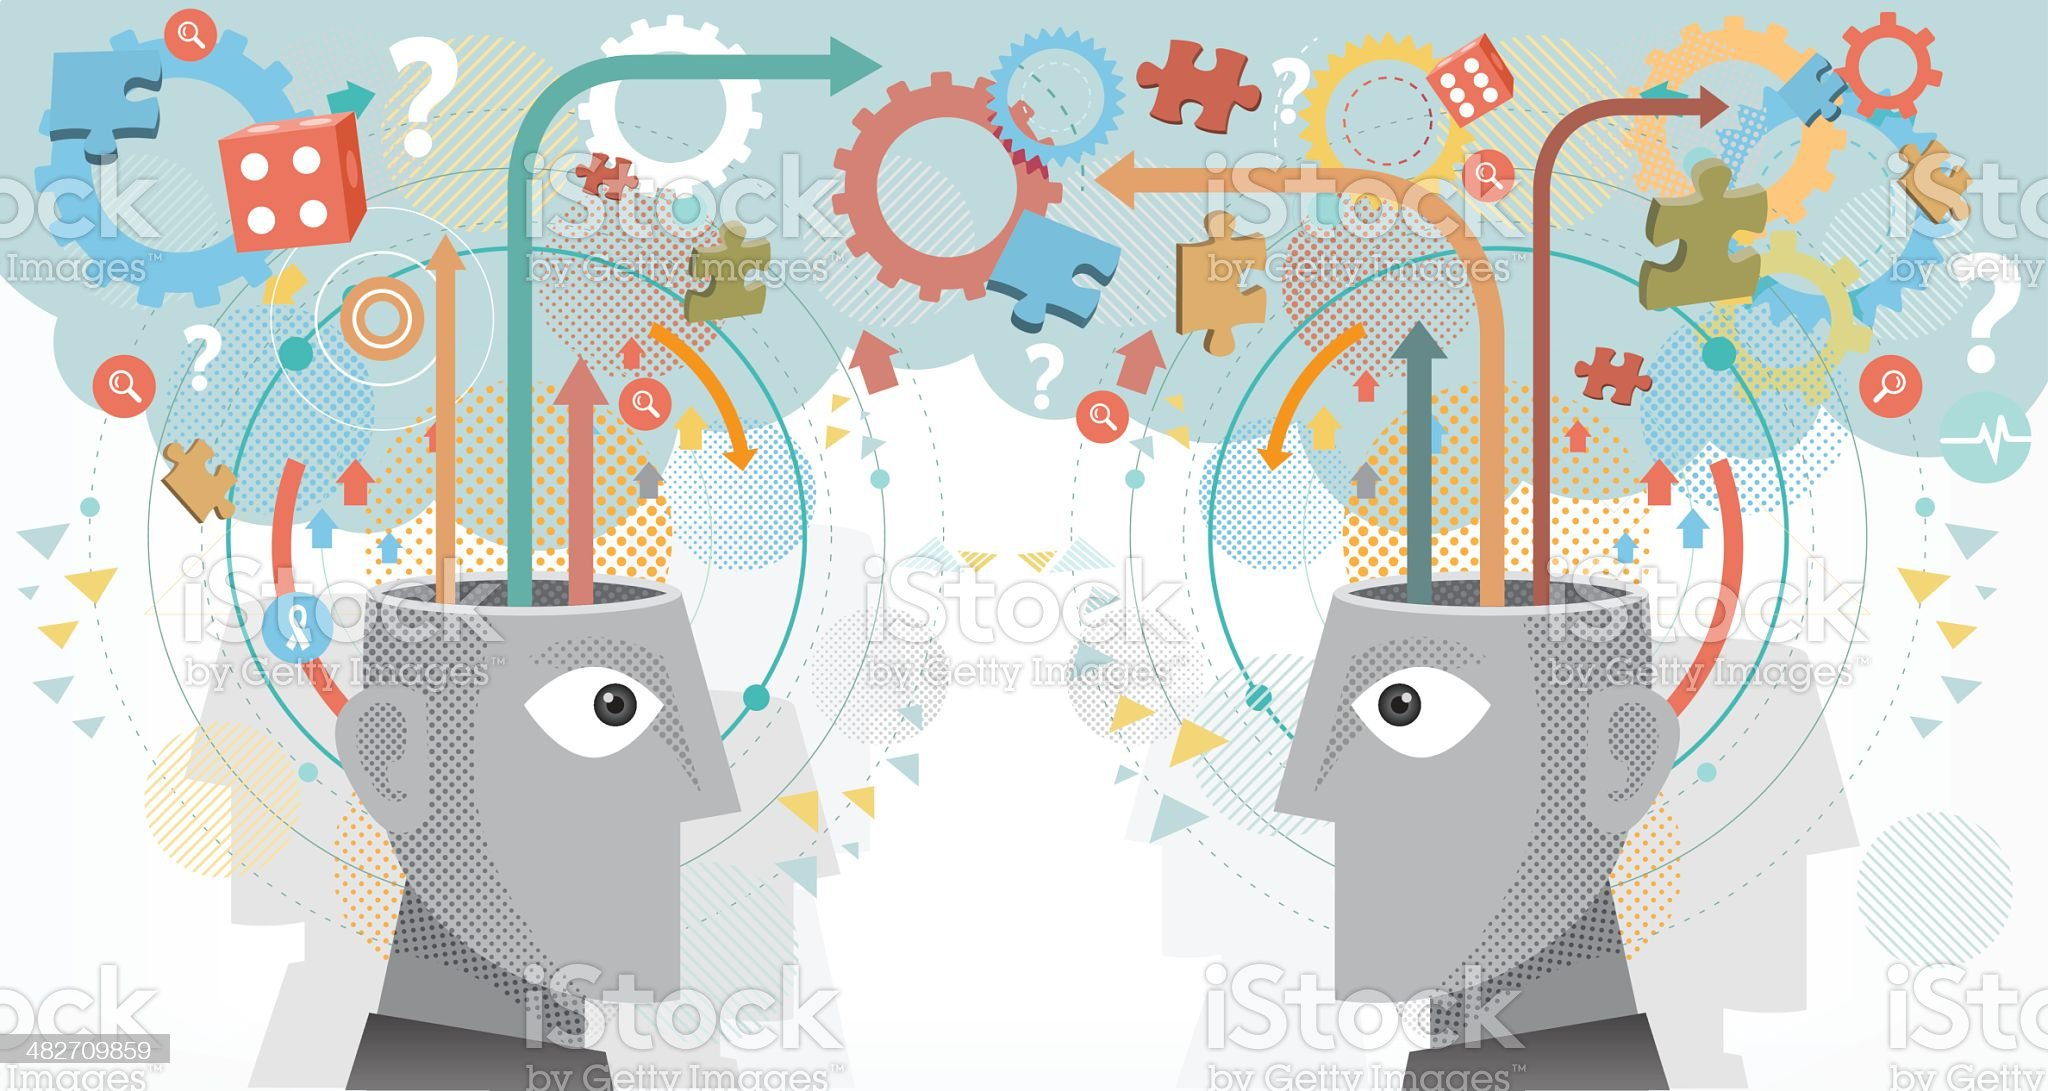 Sharing Ideas royalty-free stock vector art